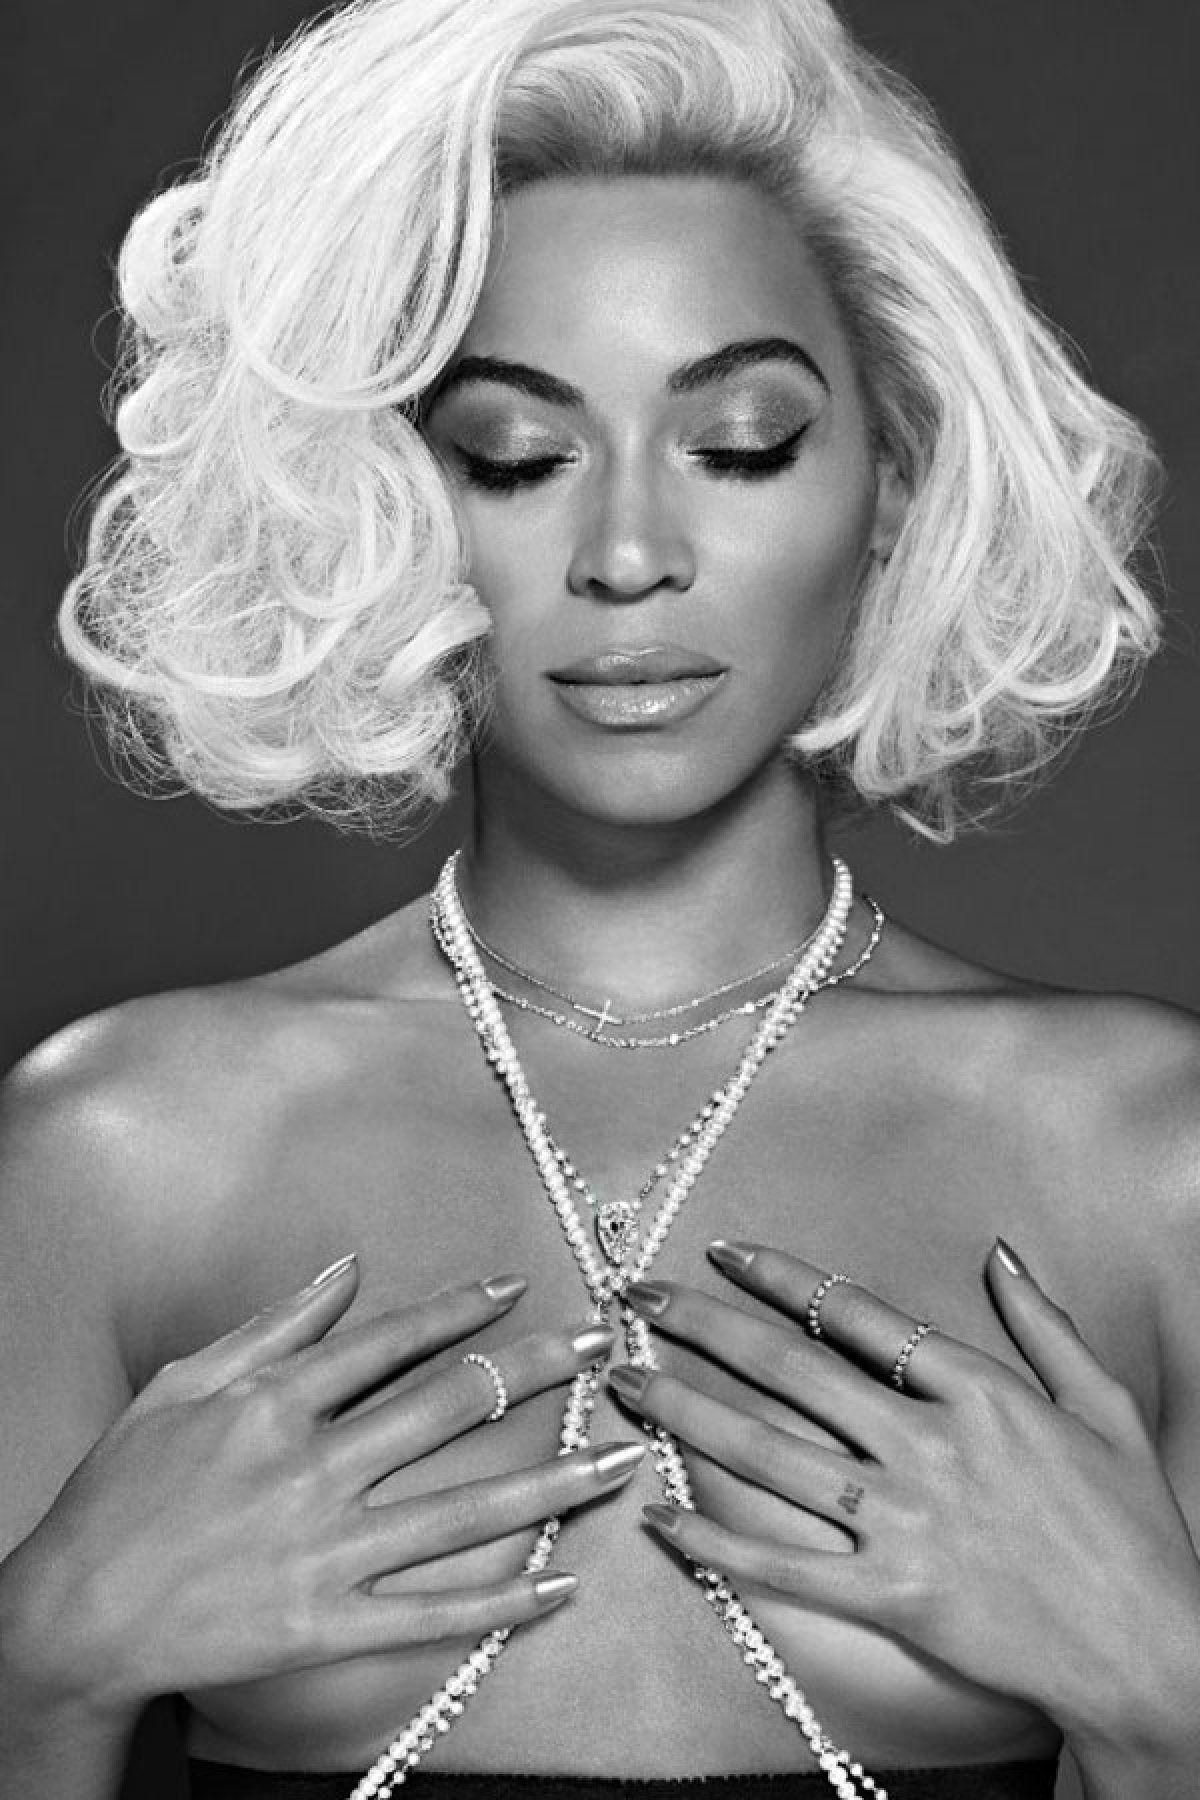 Beyoncé Desnuda Para Out Marilyn Beyonce Desnudos Y Cantantes